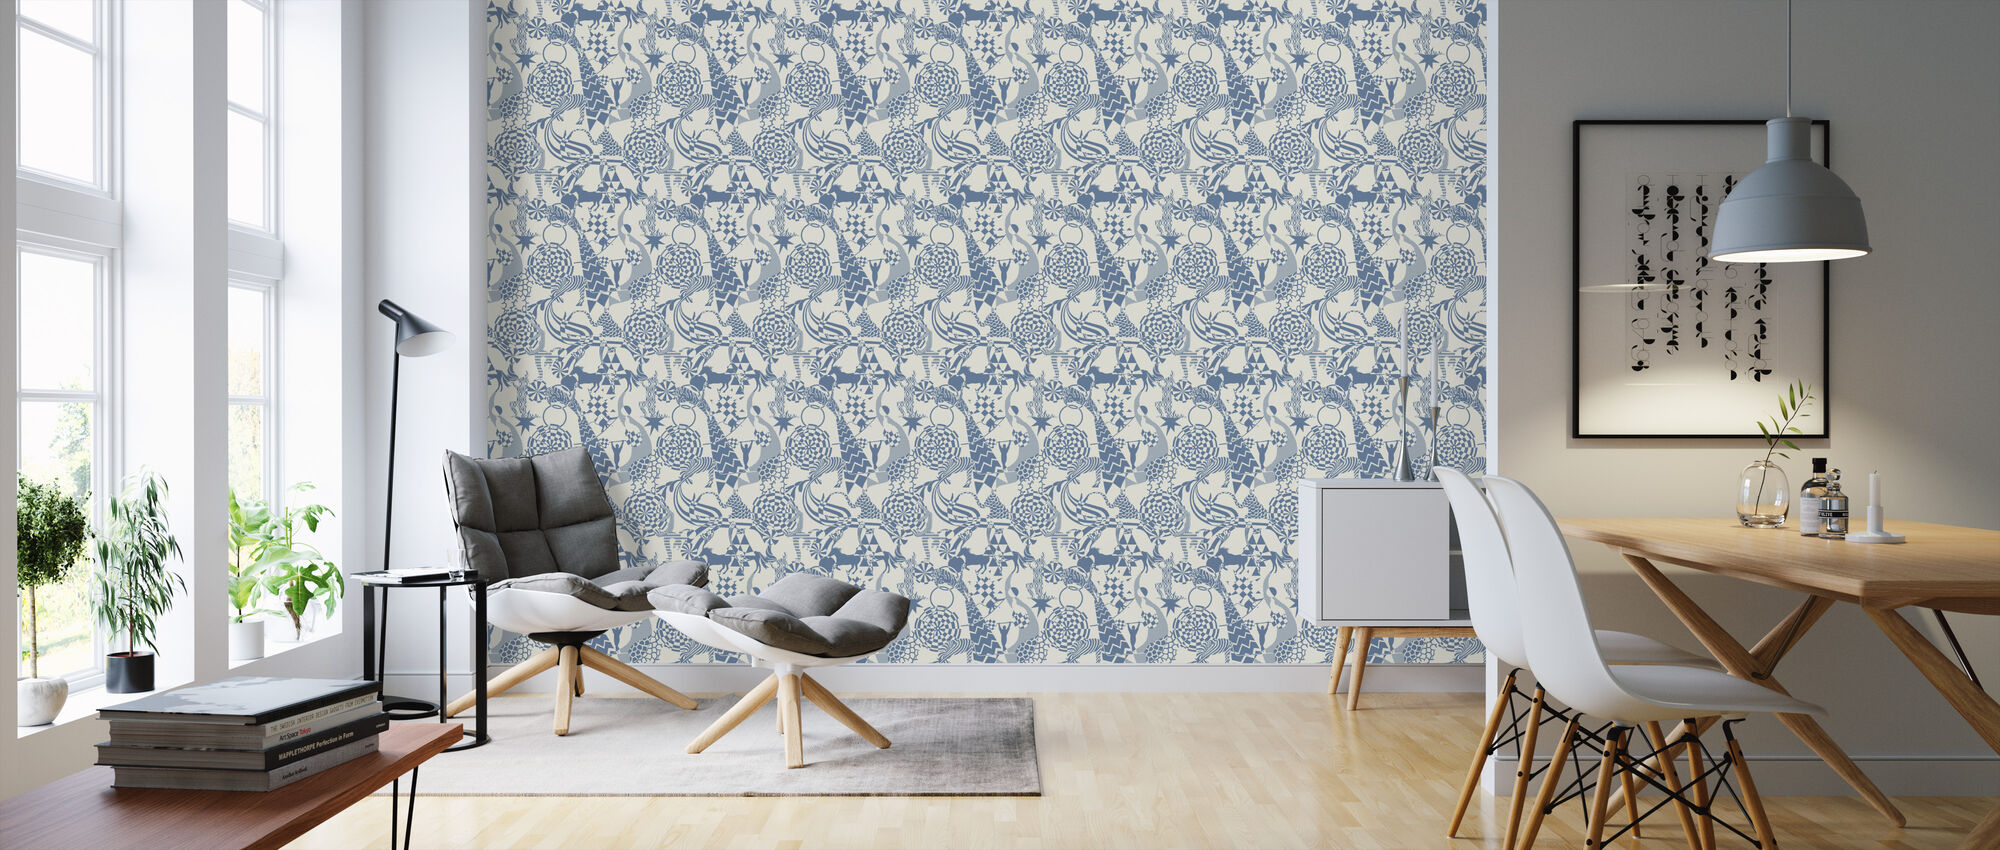 Circus - Blue - Wallpaper - Living Room